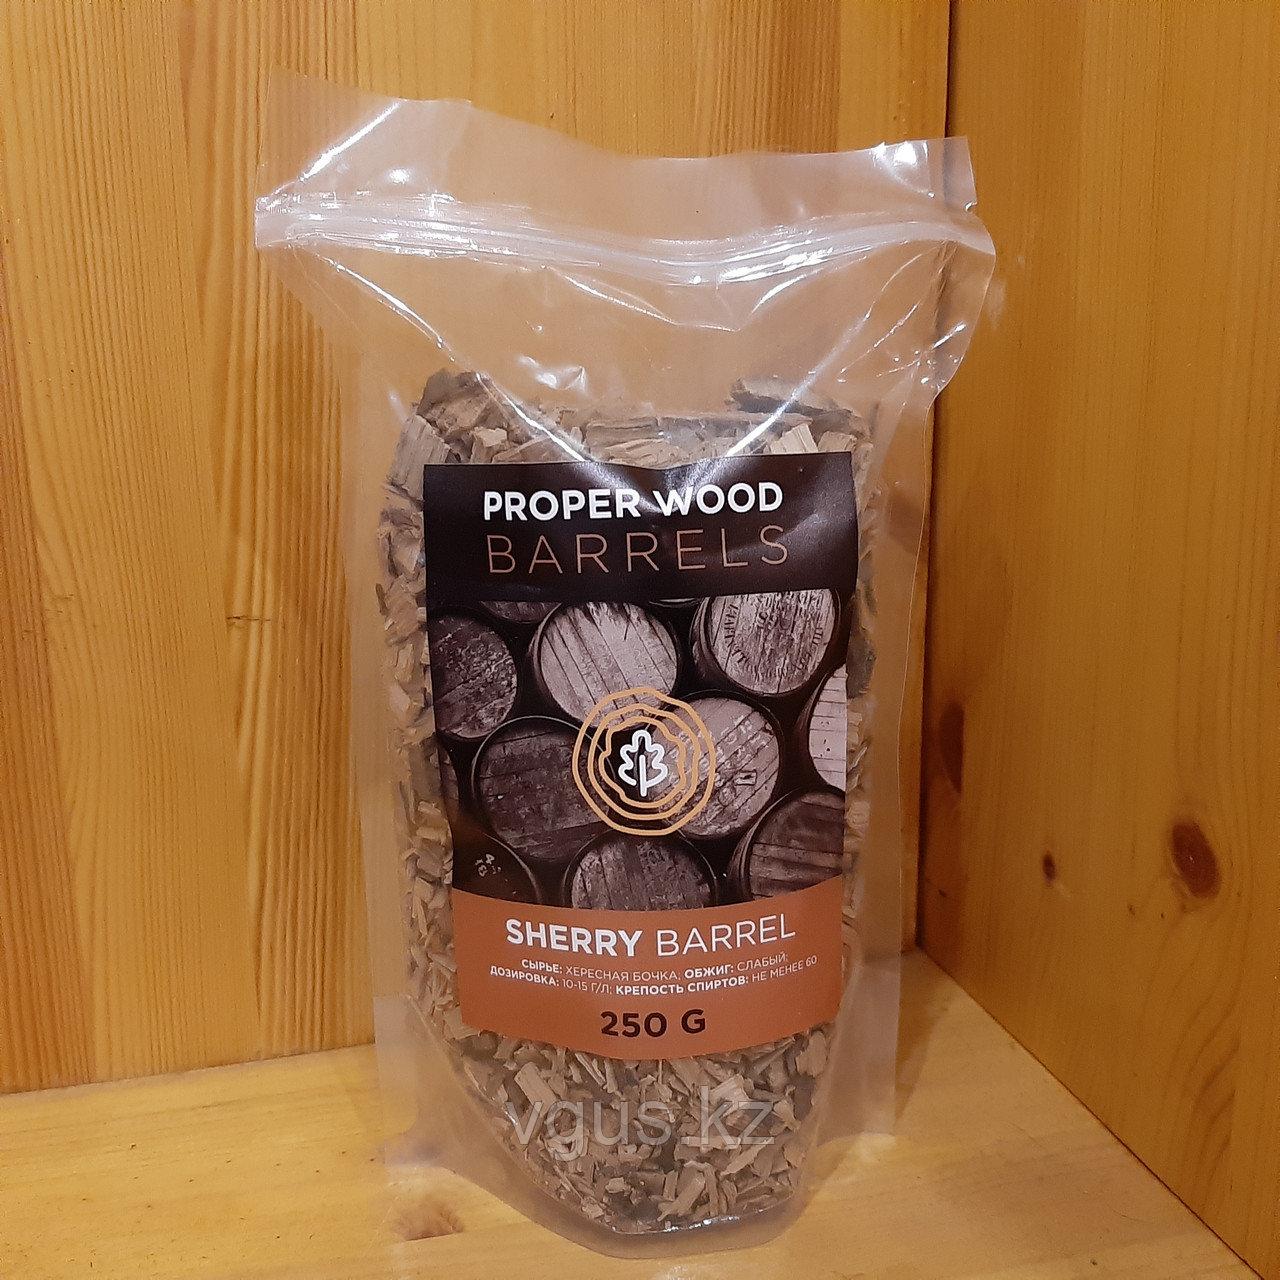 Хересная щепа Proper wood barres 250 грамм.